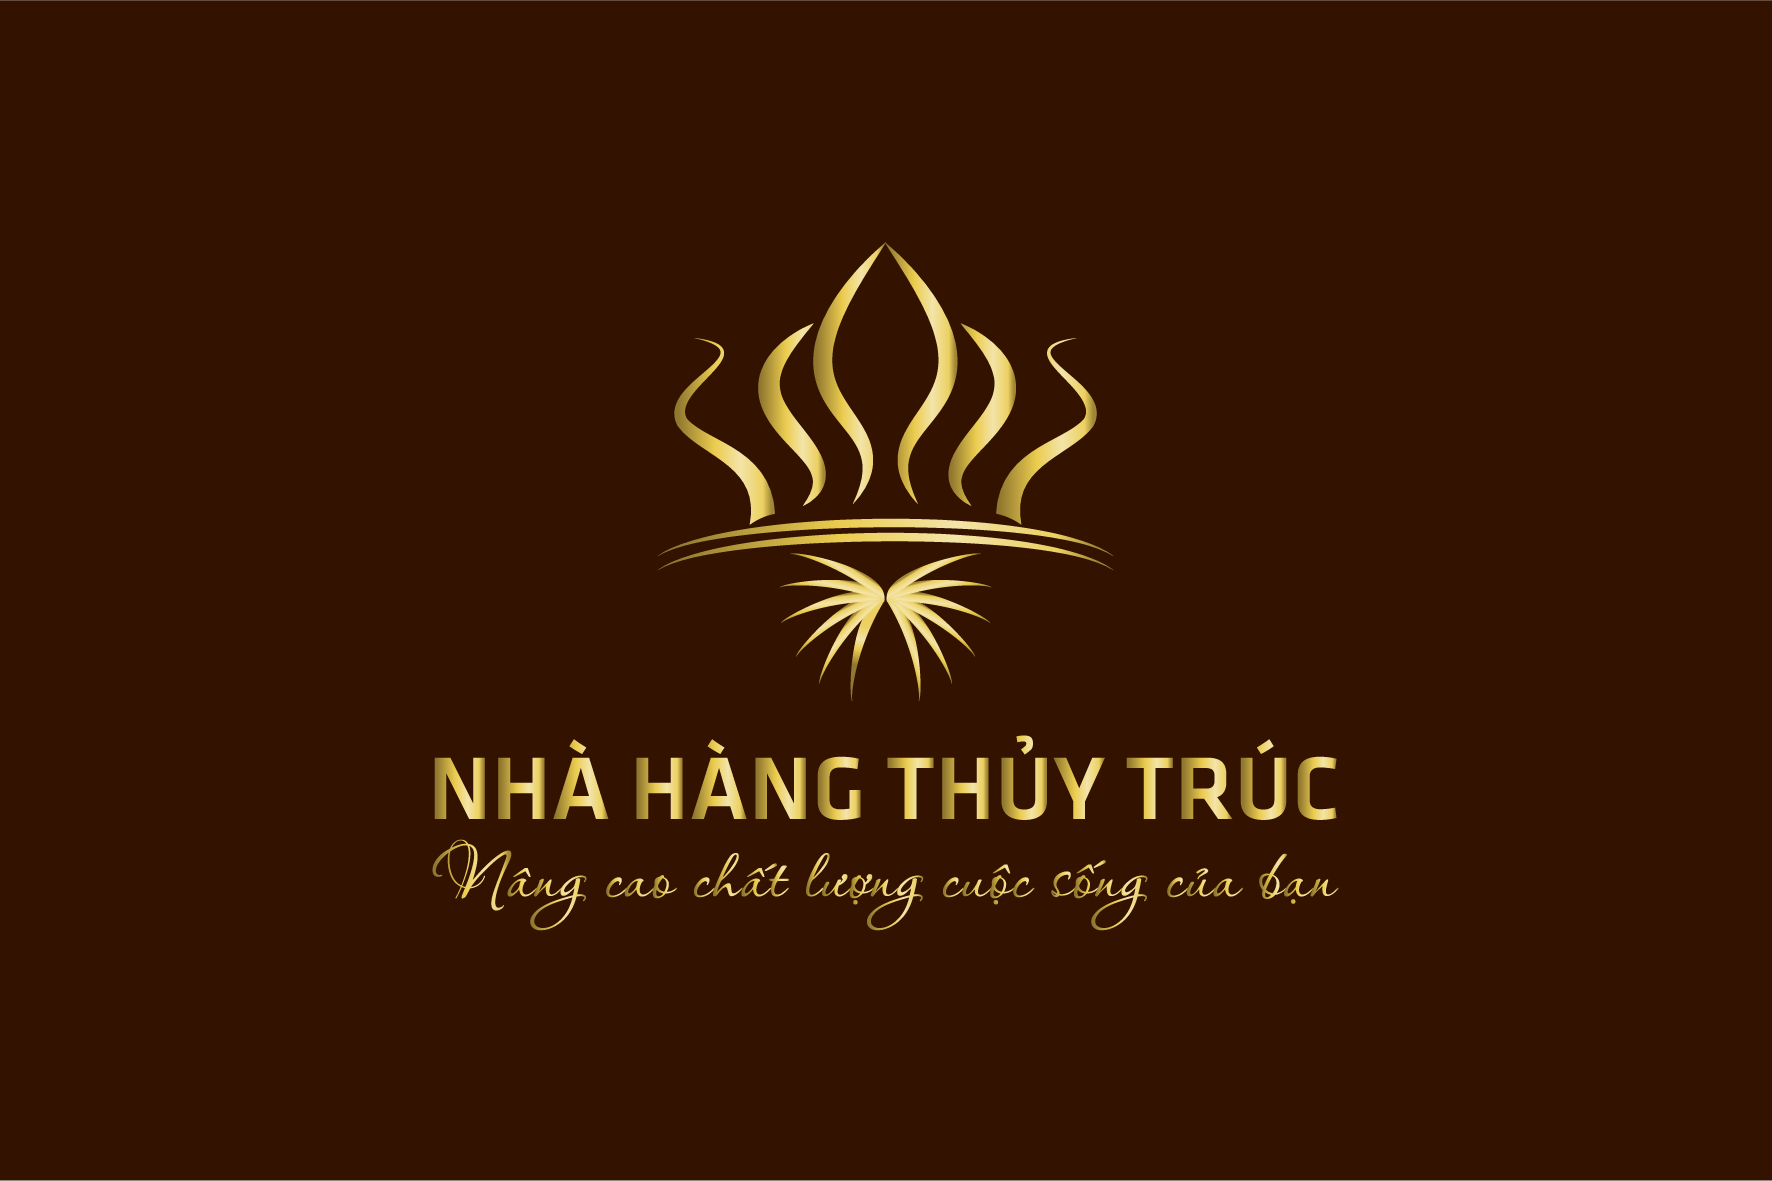 thiet ke logo nha hang viet nam1